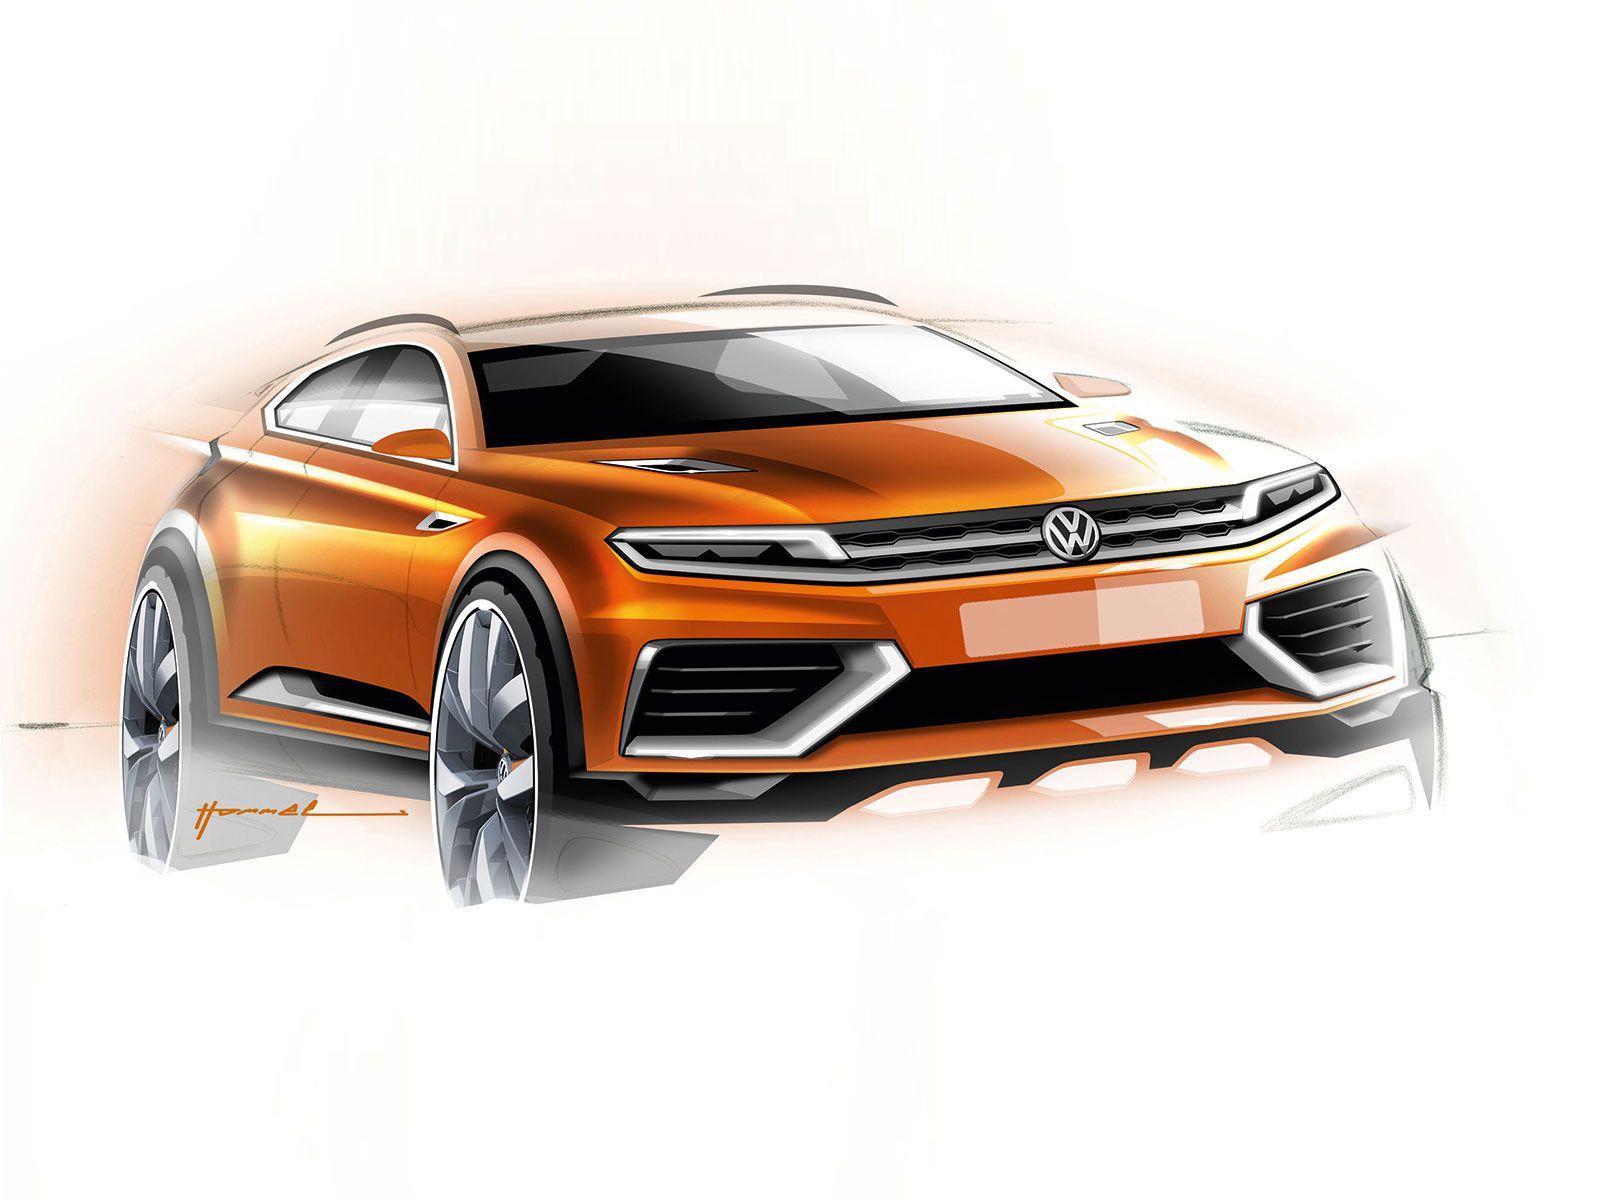 Volkswagen crossblue coupe concept design sketch